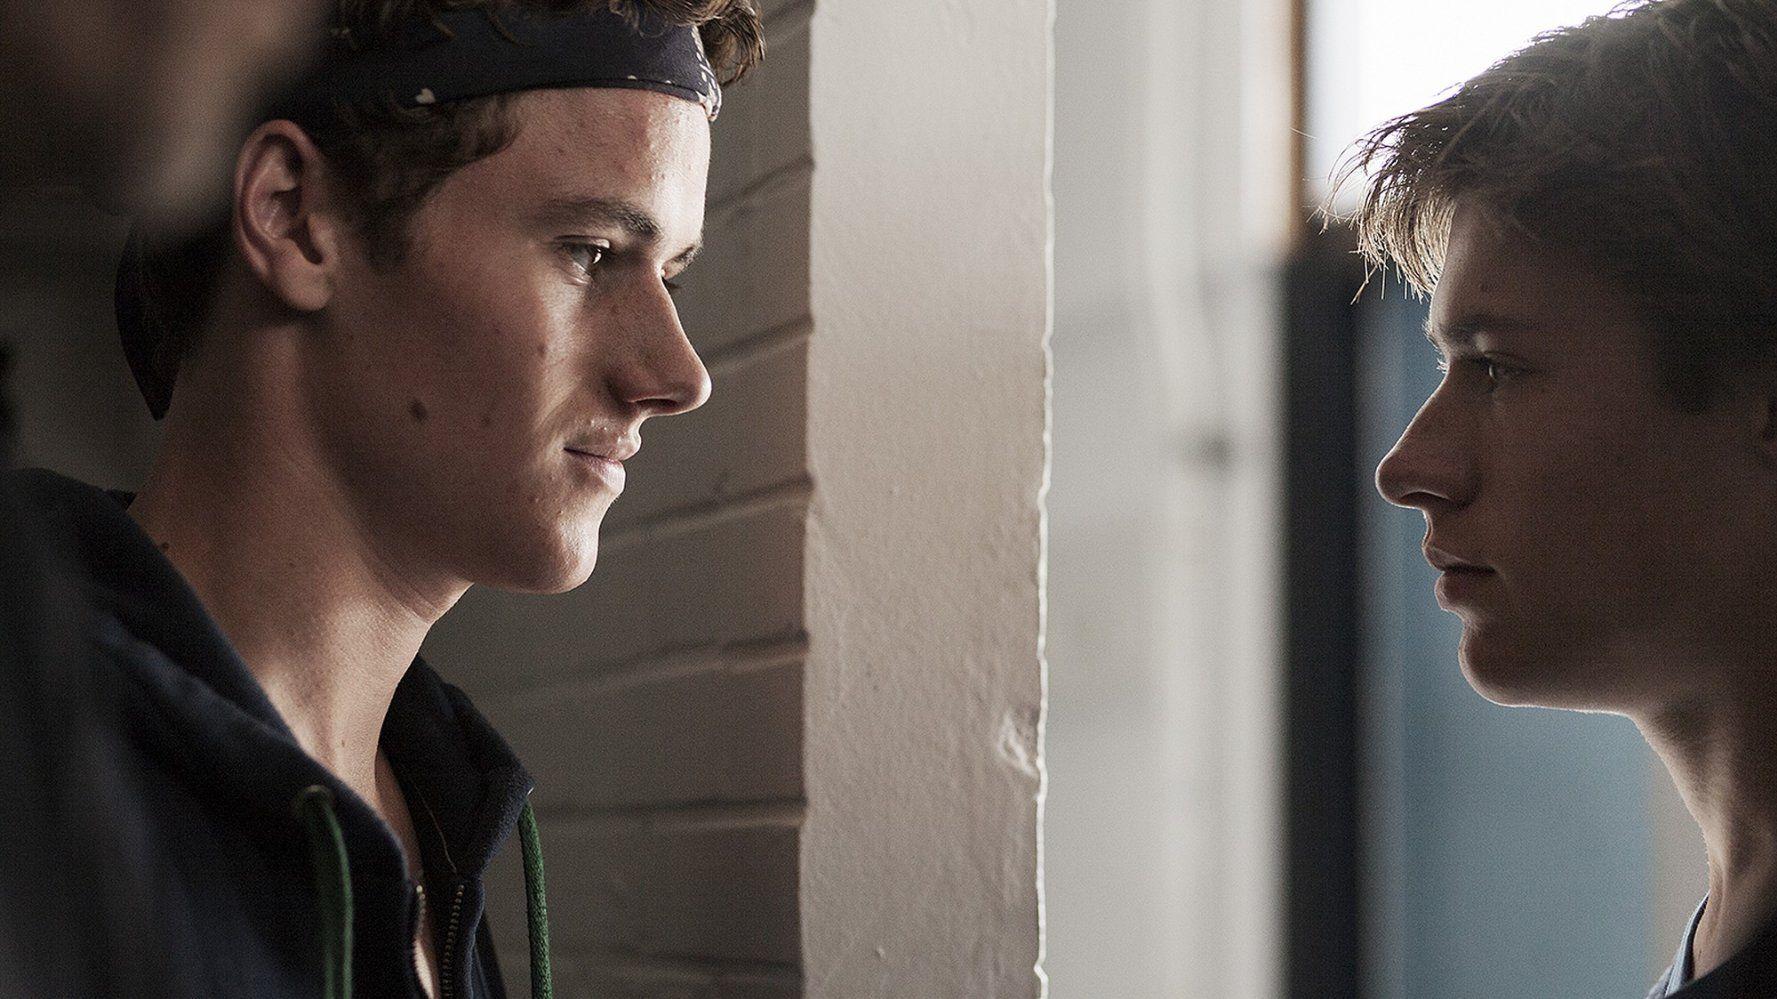 Canadian Actor Elliot Page Shares He Is Transgender